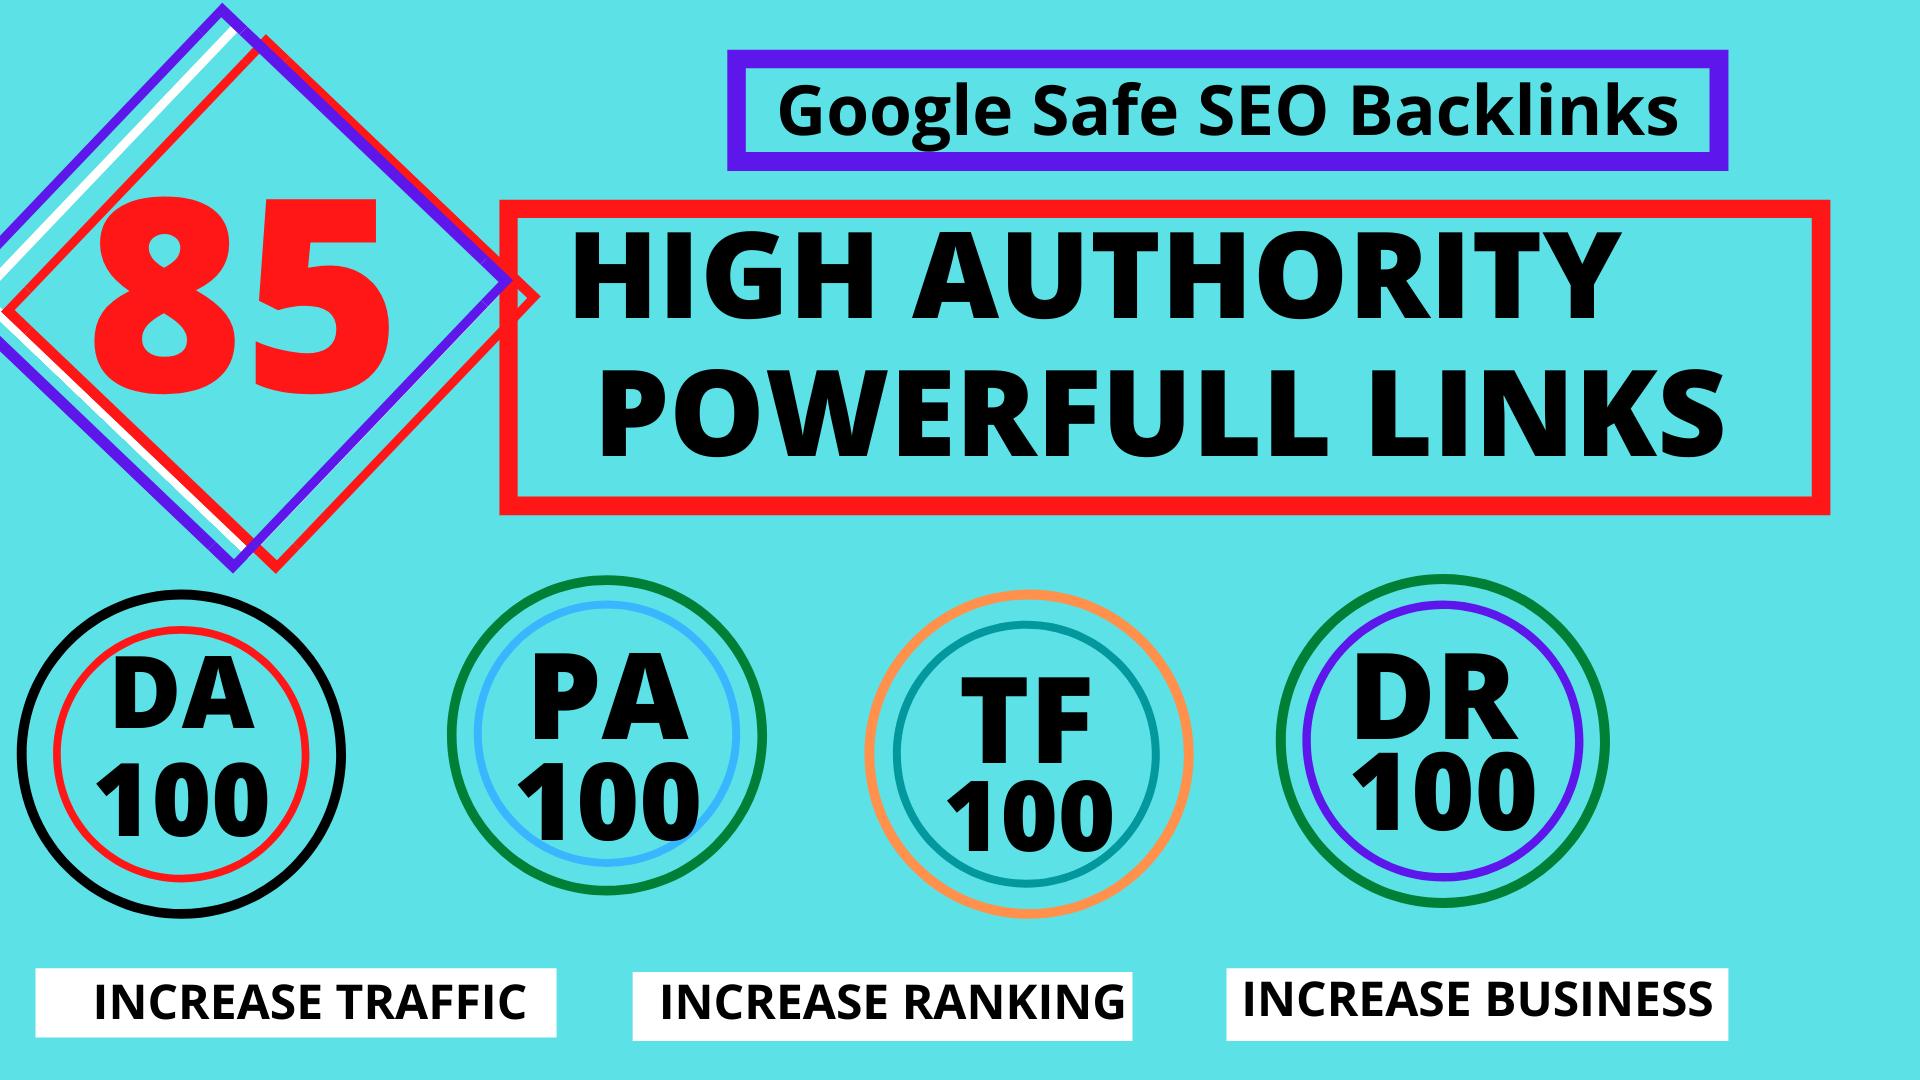 TOP OFFER-Build 85 Unique Domain SEO Backlinks On TF100 DA100 Sites for